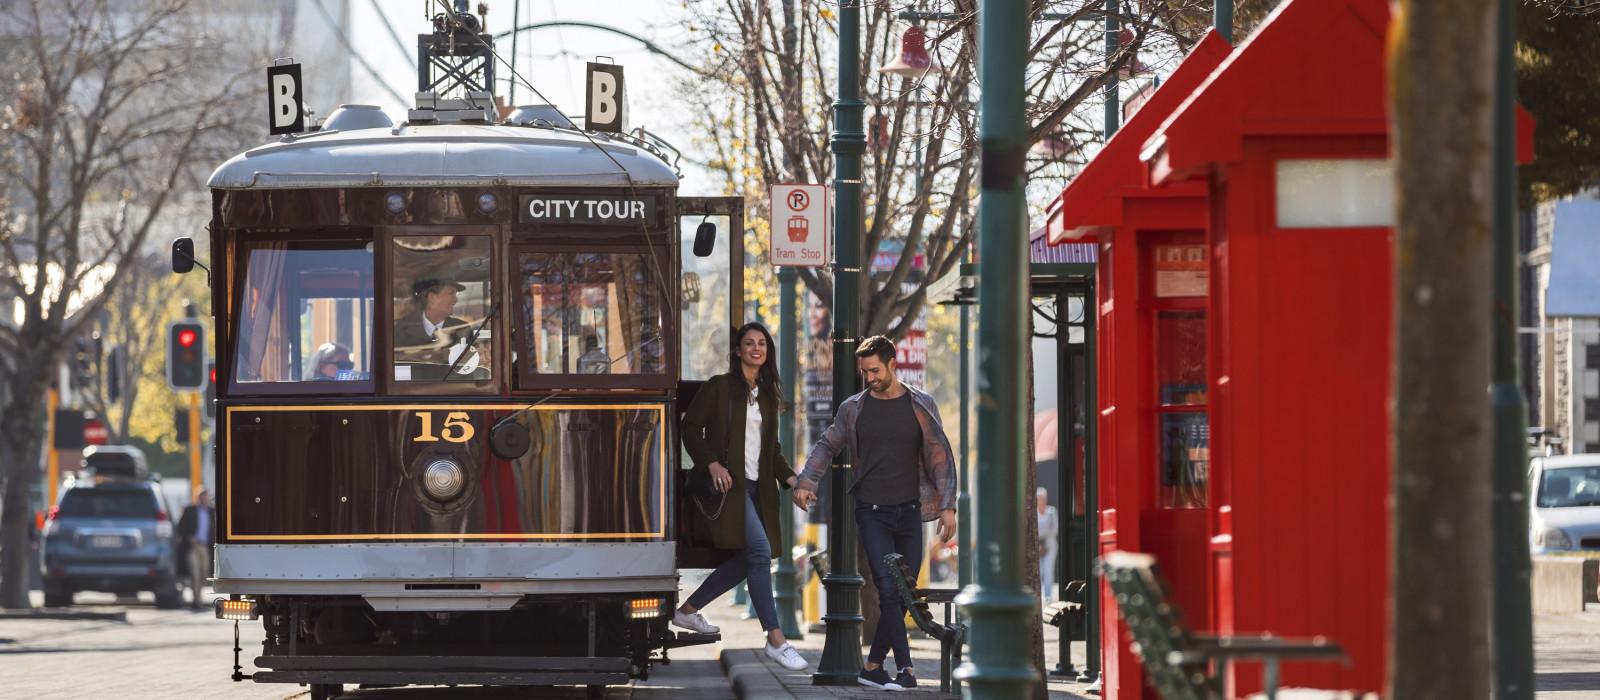 Reiseziel Christchurch Neuseeland